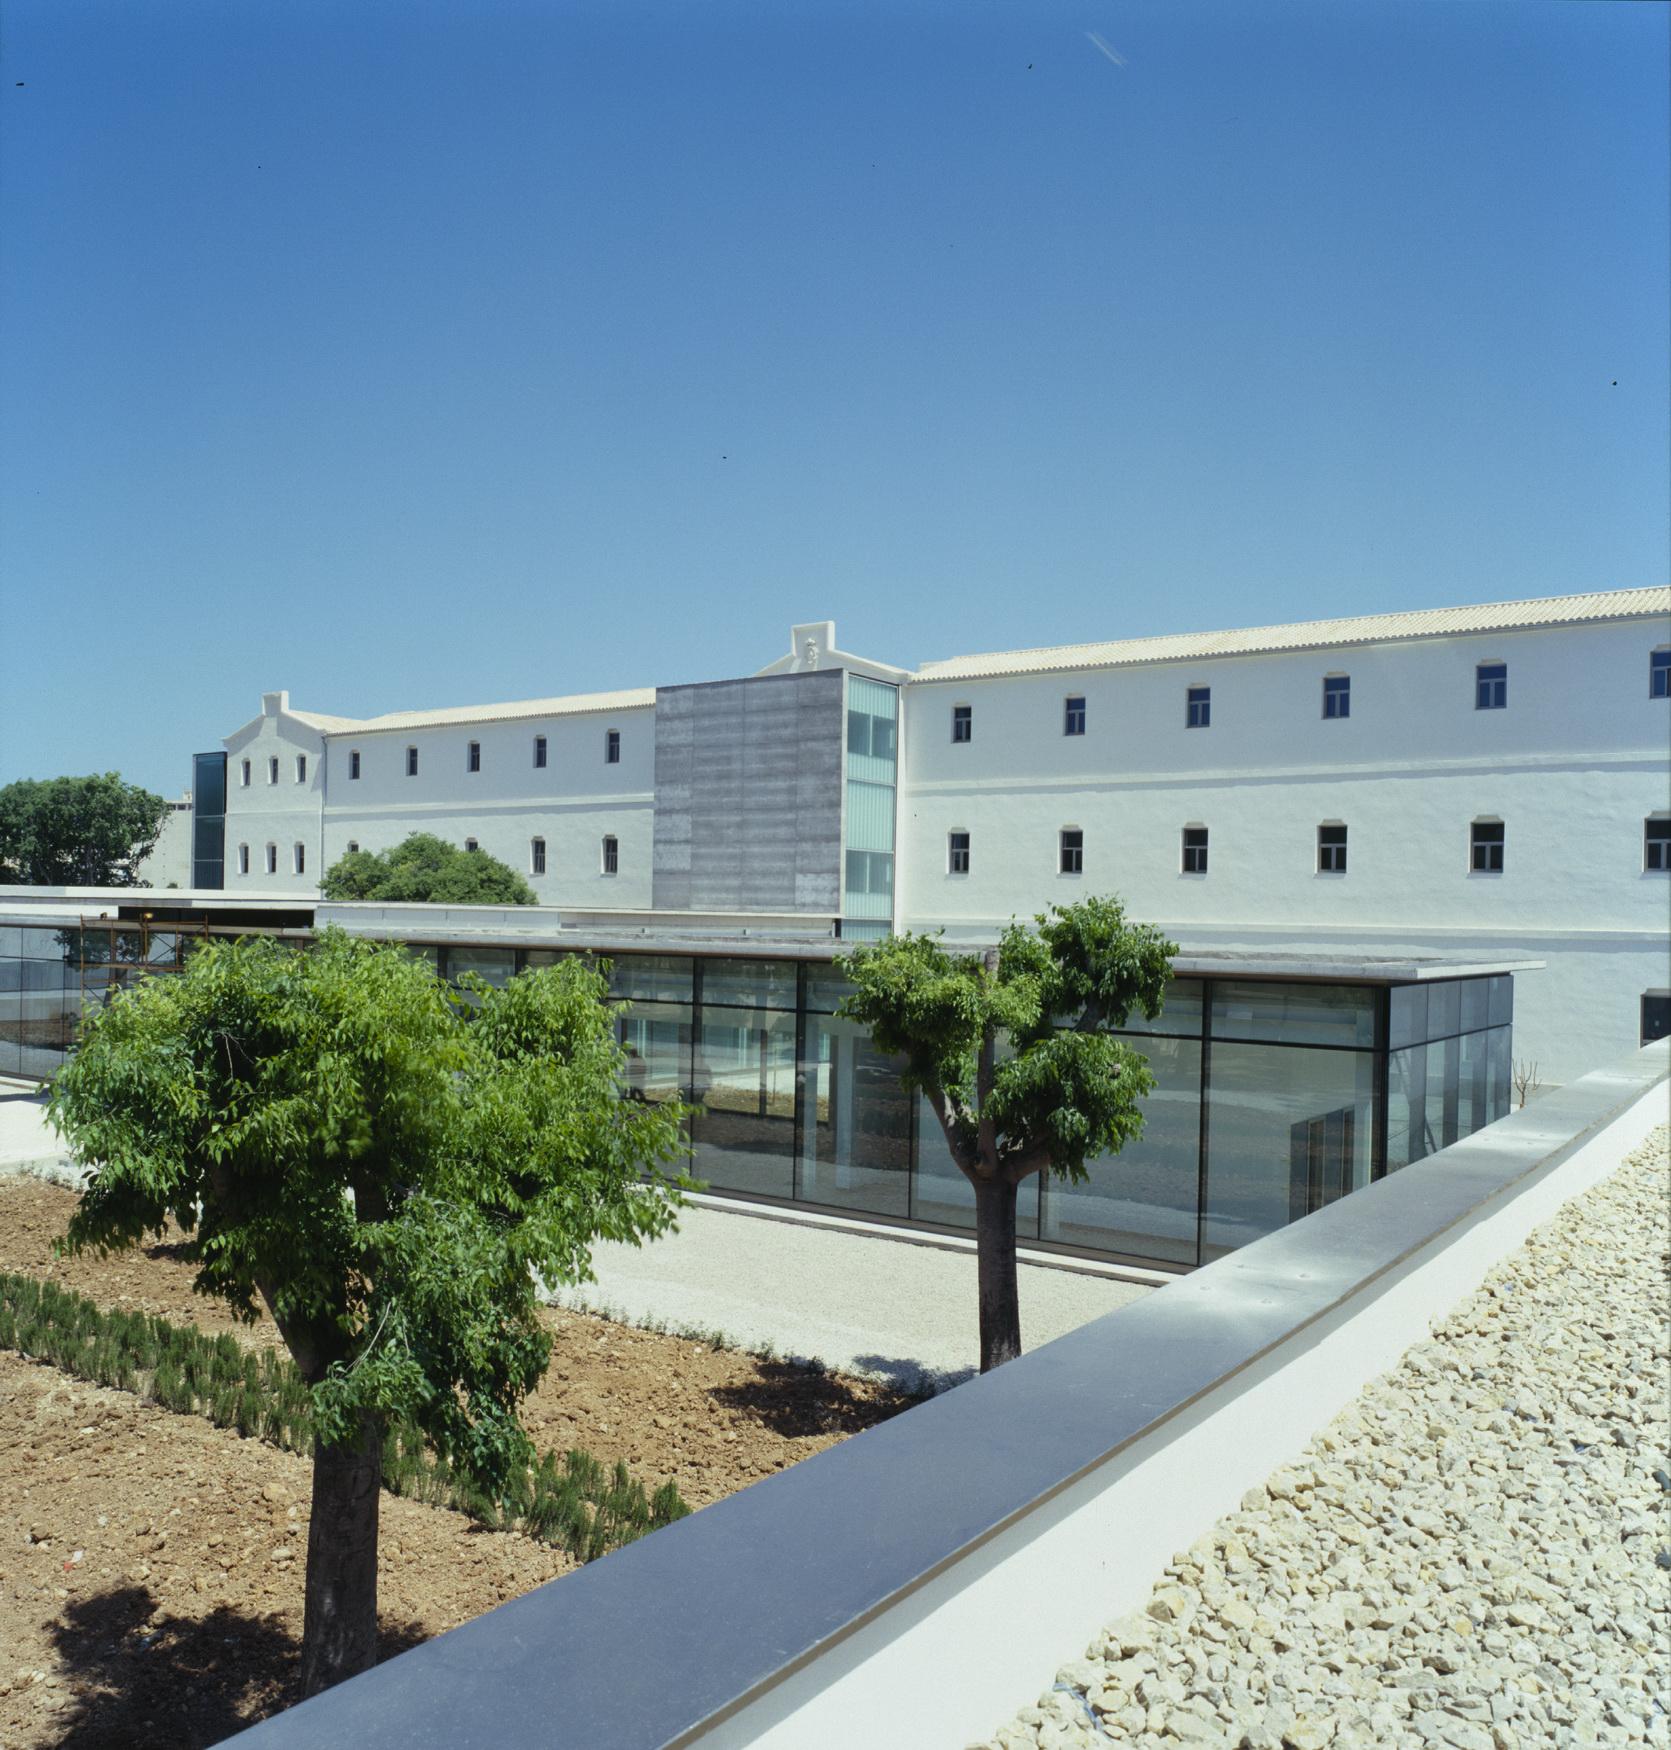 Hospital de Psicogeriatría / CMV Architects, Cortesia de CMV Architects